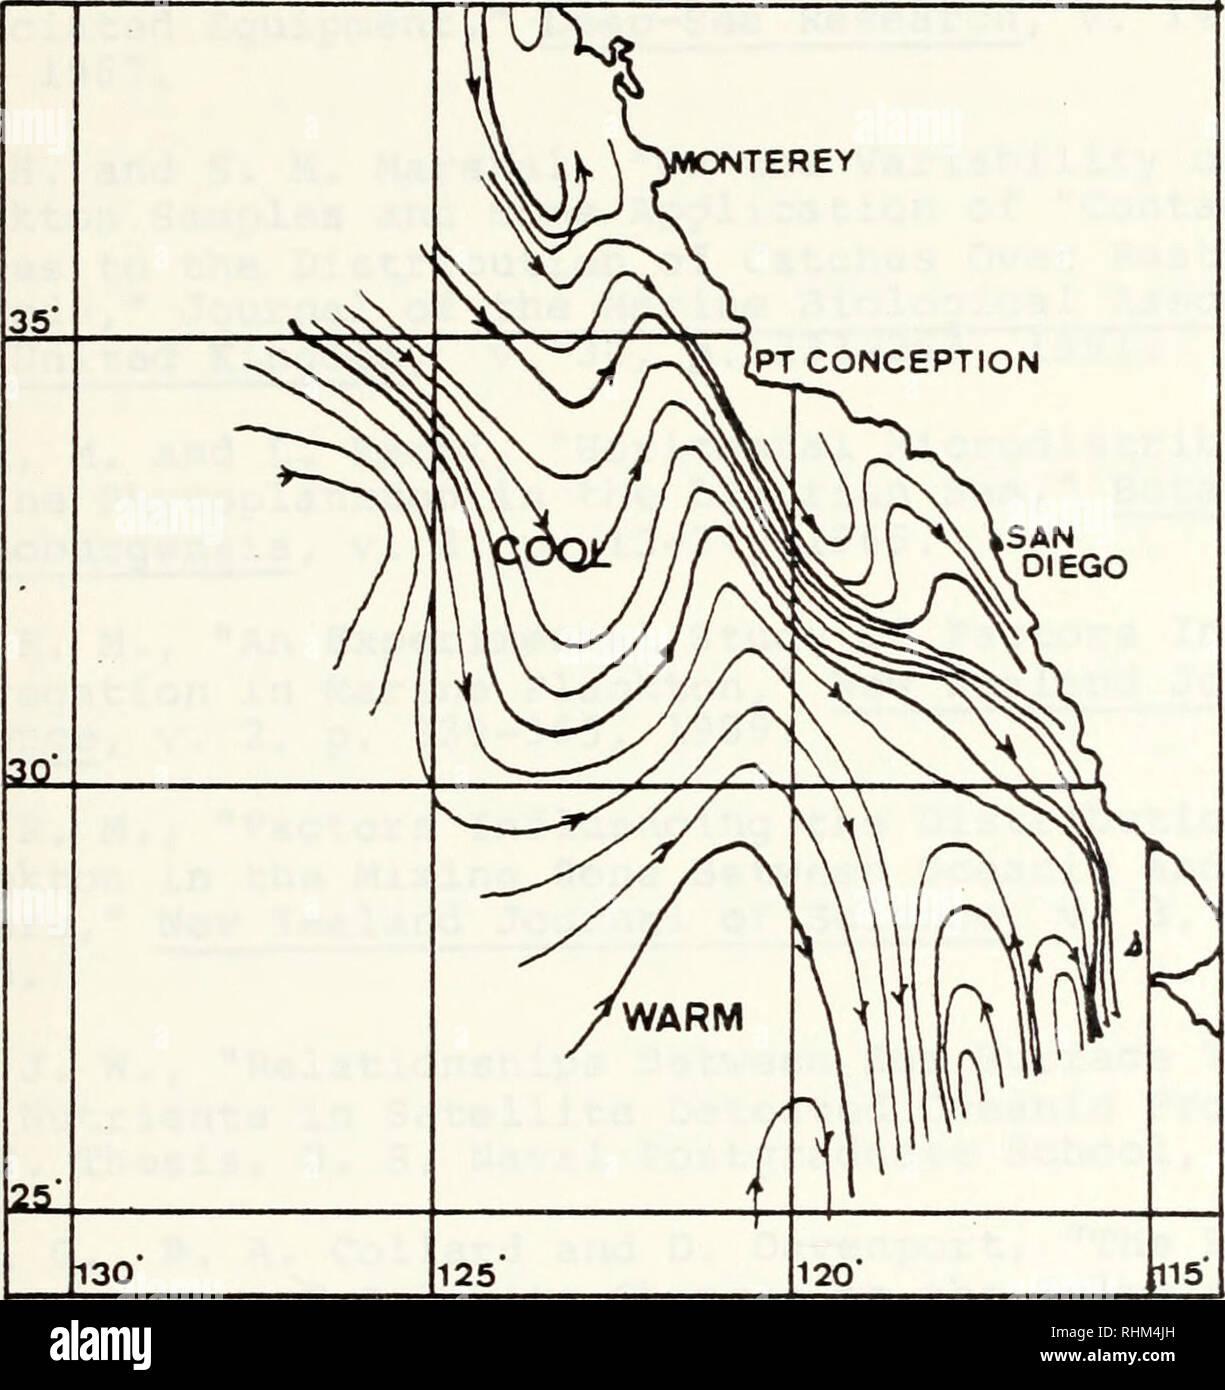 1973 plymouth satellite wiring diagram